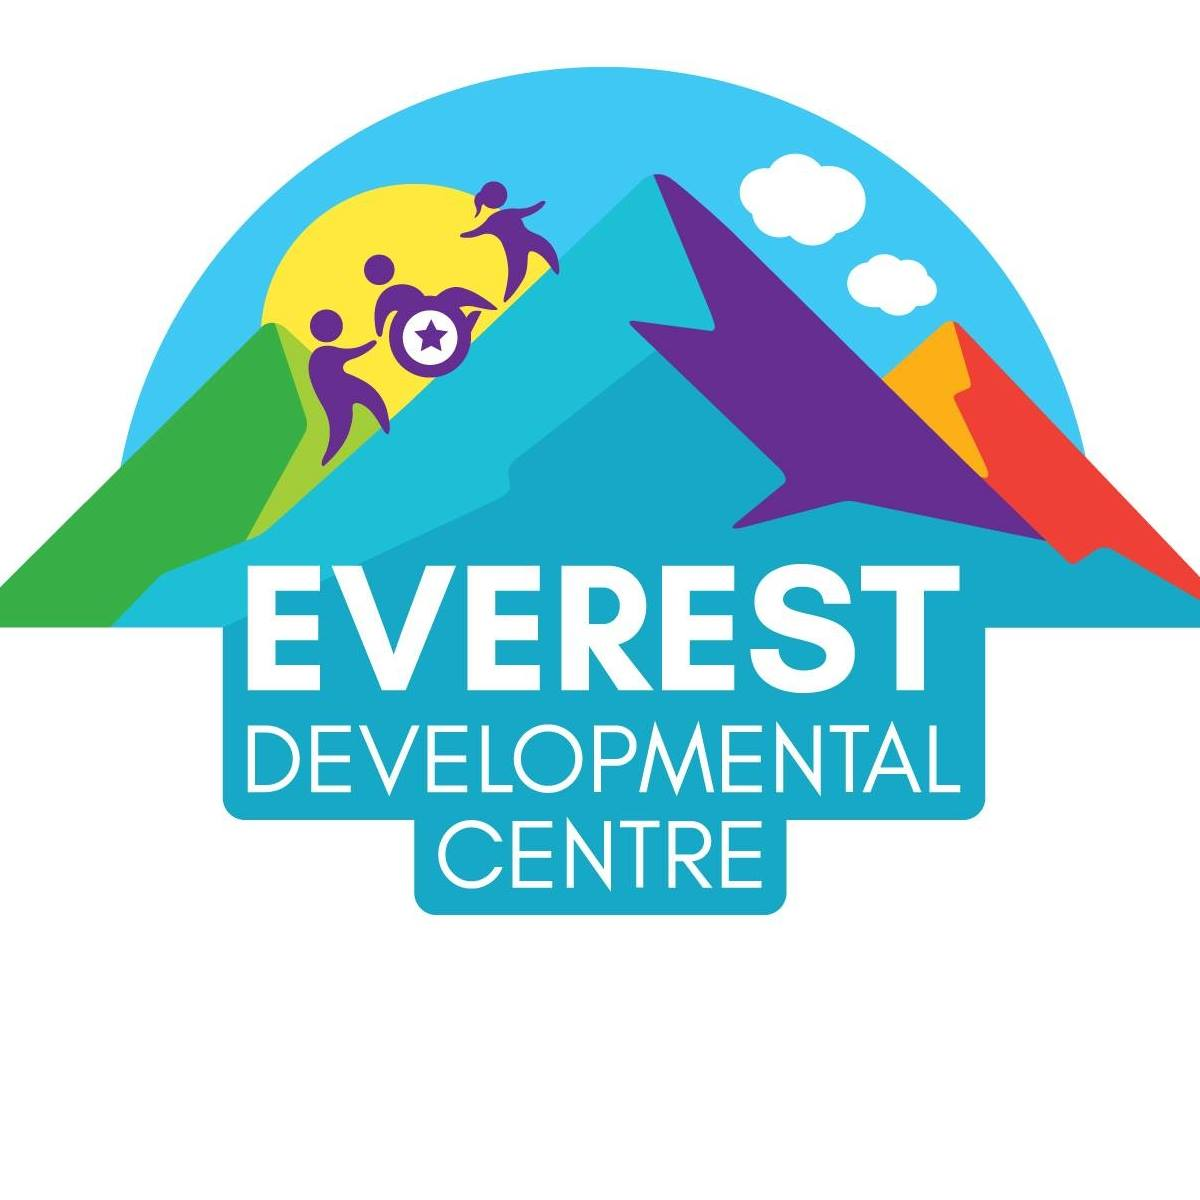 Everest Developmental Centre